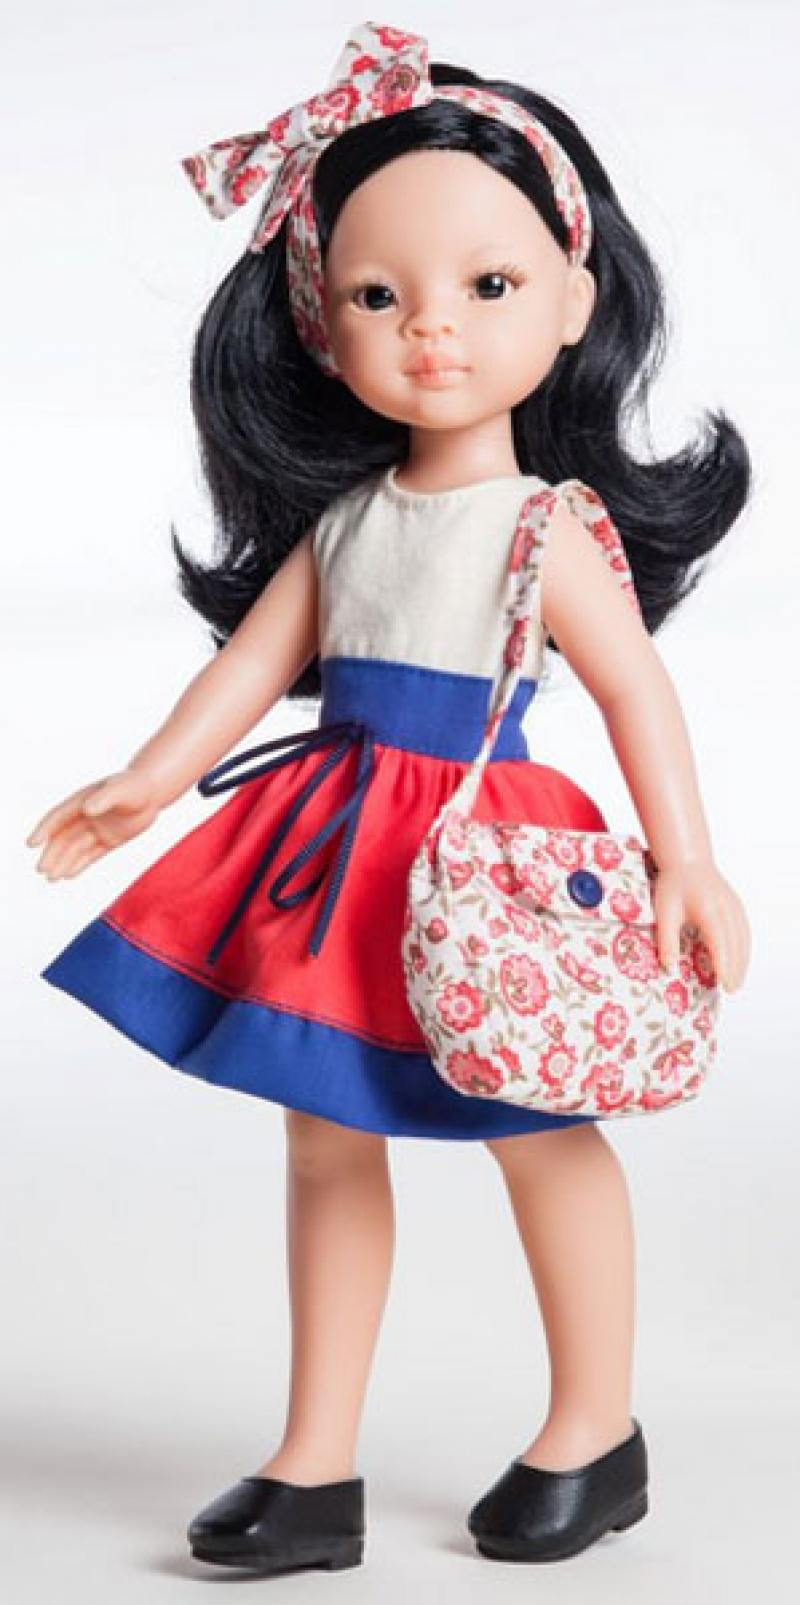 Кукла Paola Reina Лиу 32 см 04508 paola reina горди без одежды 34 см 34021